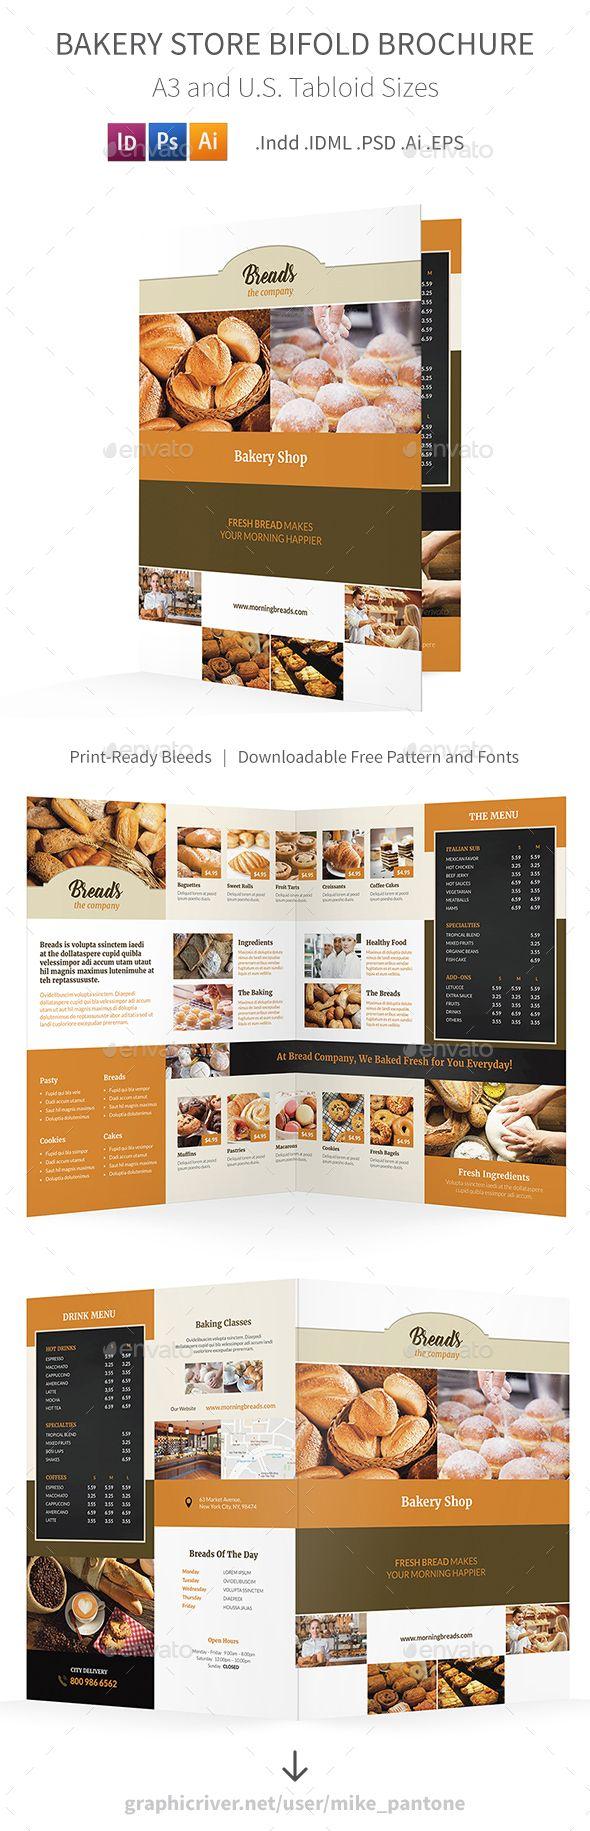 Best 25 Bakery Store Ideas On Pinterest Bakery Design